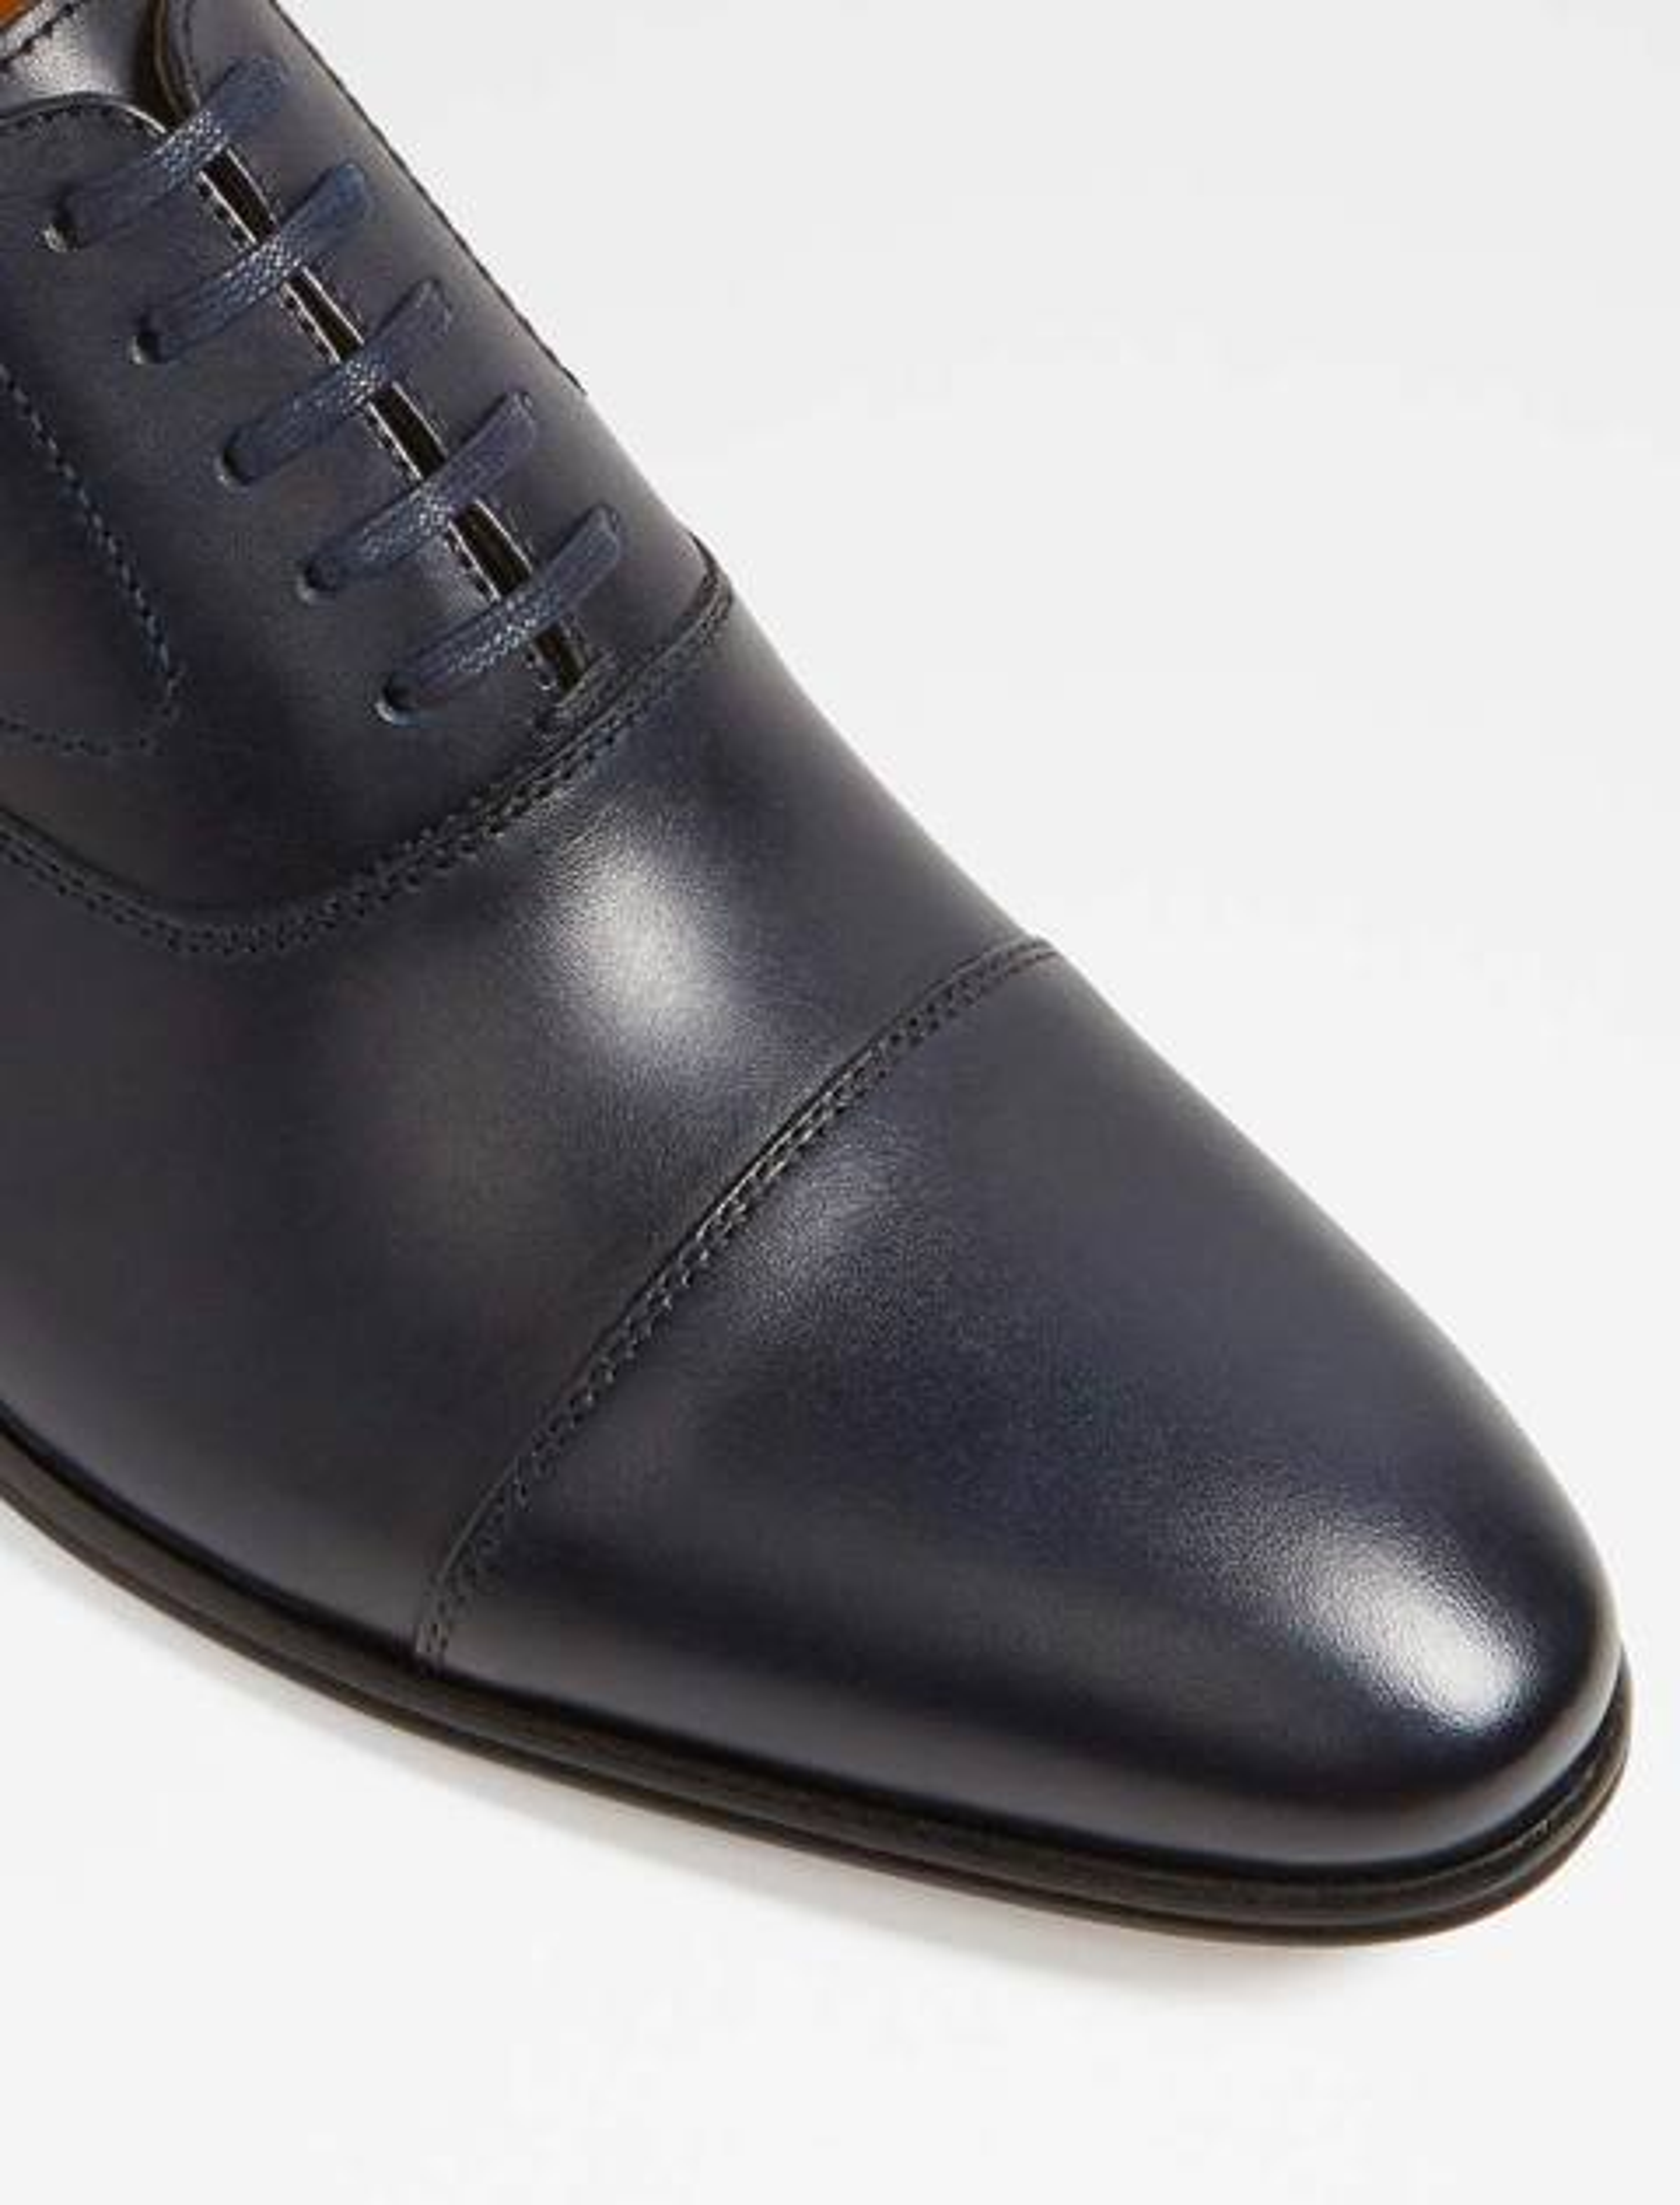 کفش رسمی چرم مردانه - سرمه اي - 4